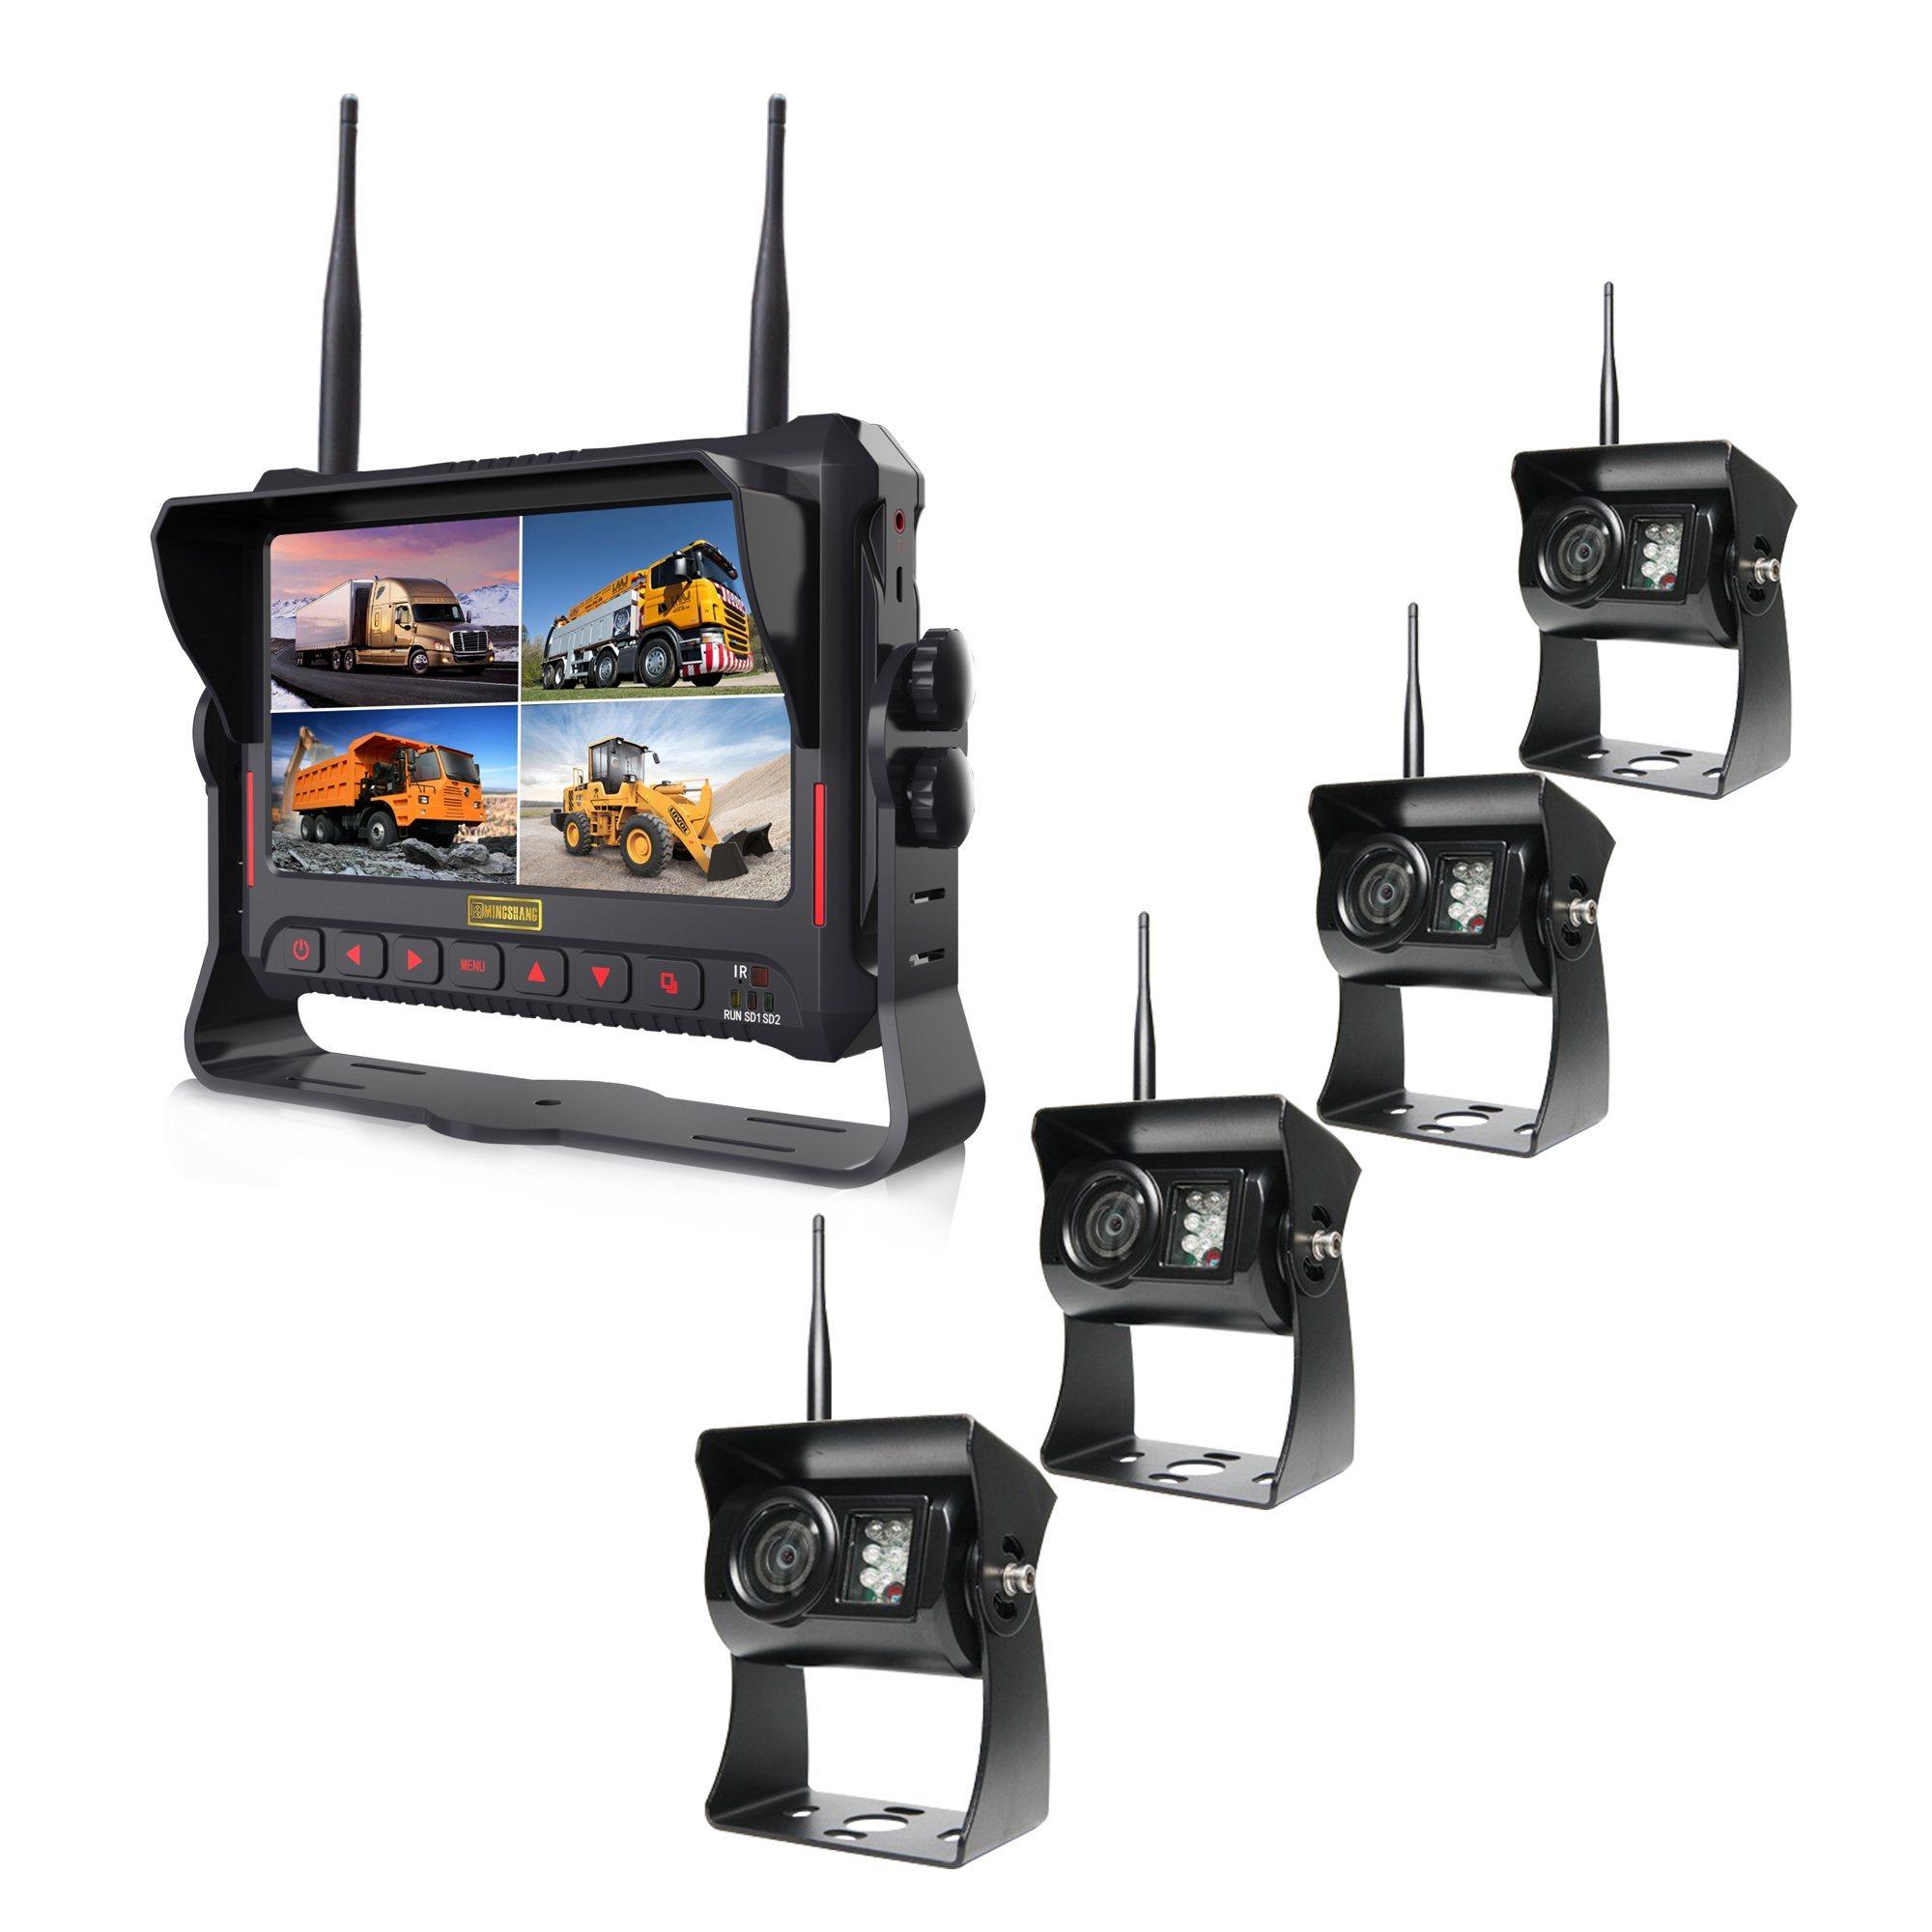 7inch Digital Wireless Recording Rear View System